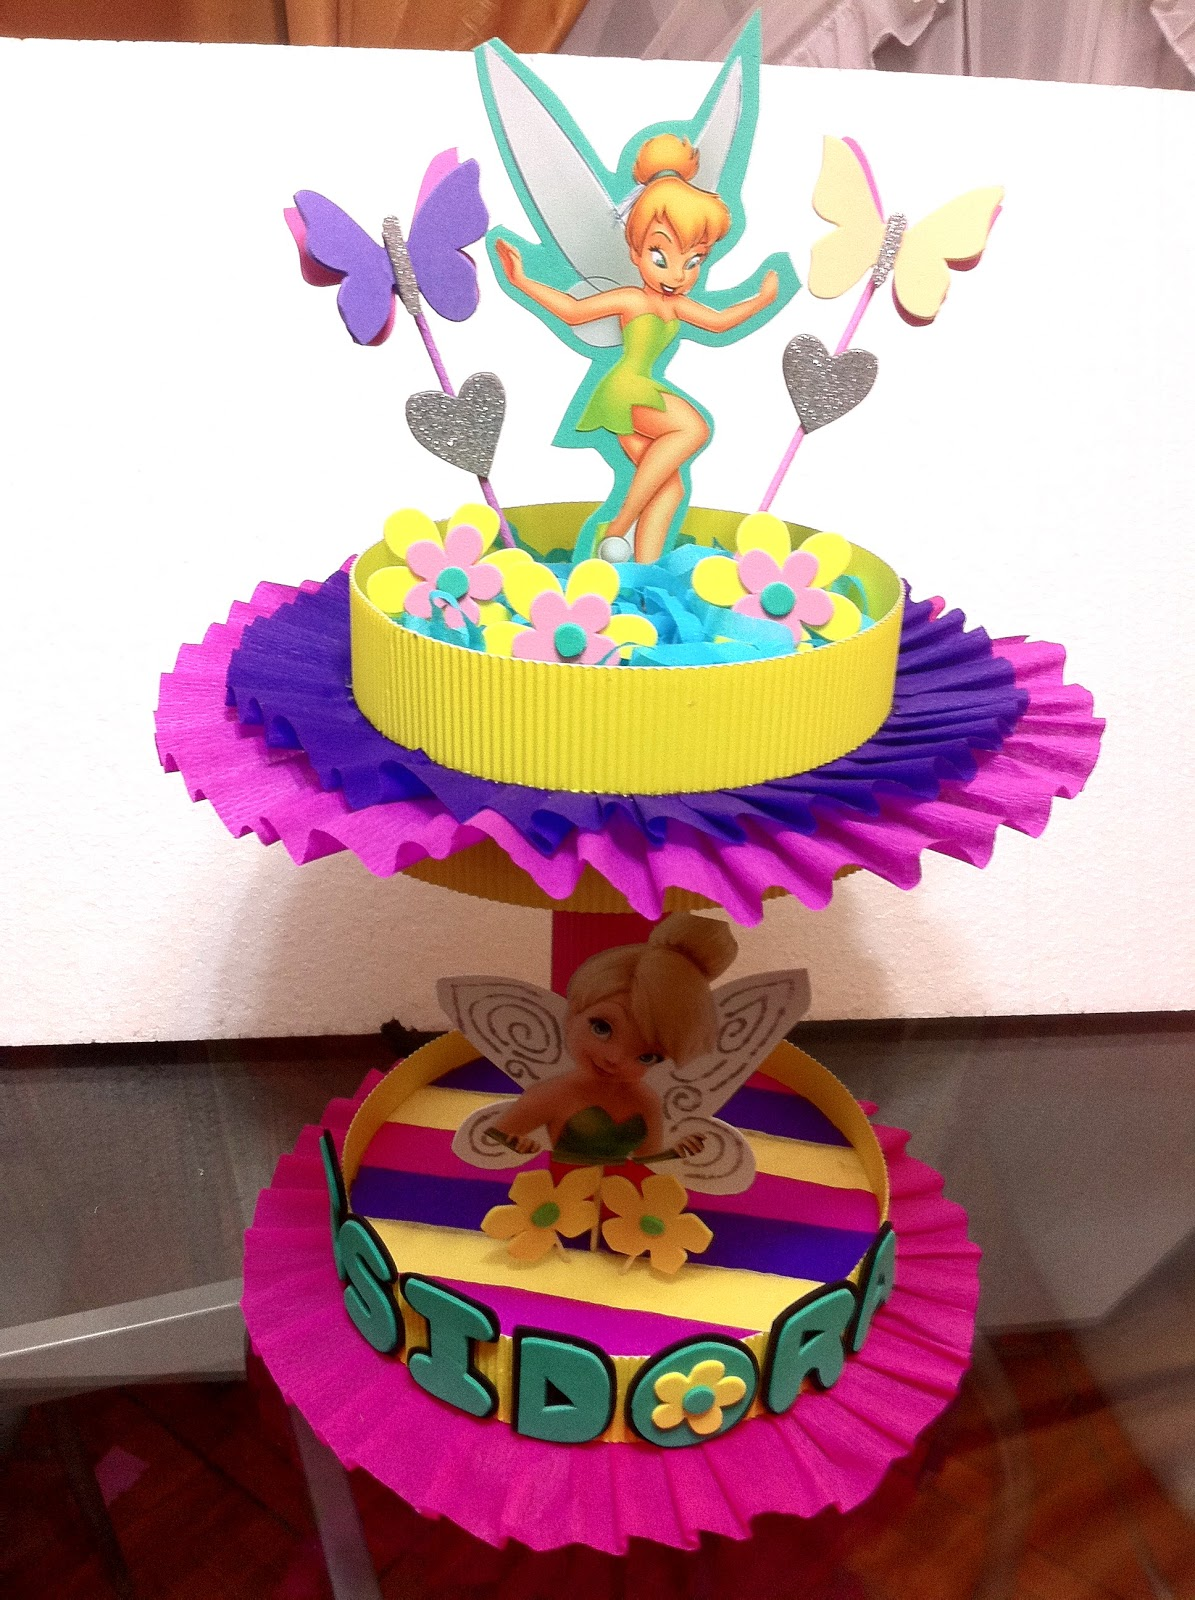 Decoraciones infantiles dulceros tinkerbell for Decoraciones infantiles